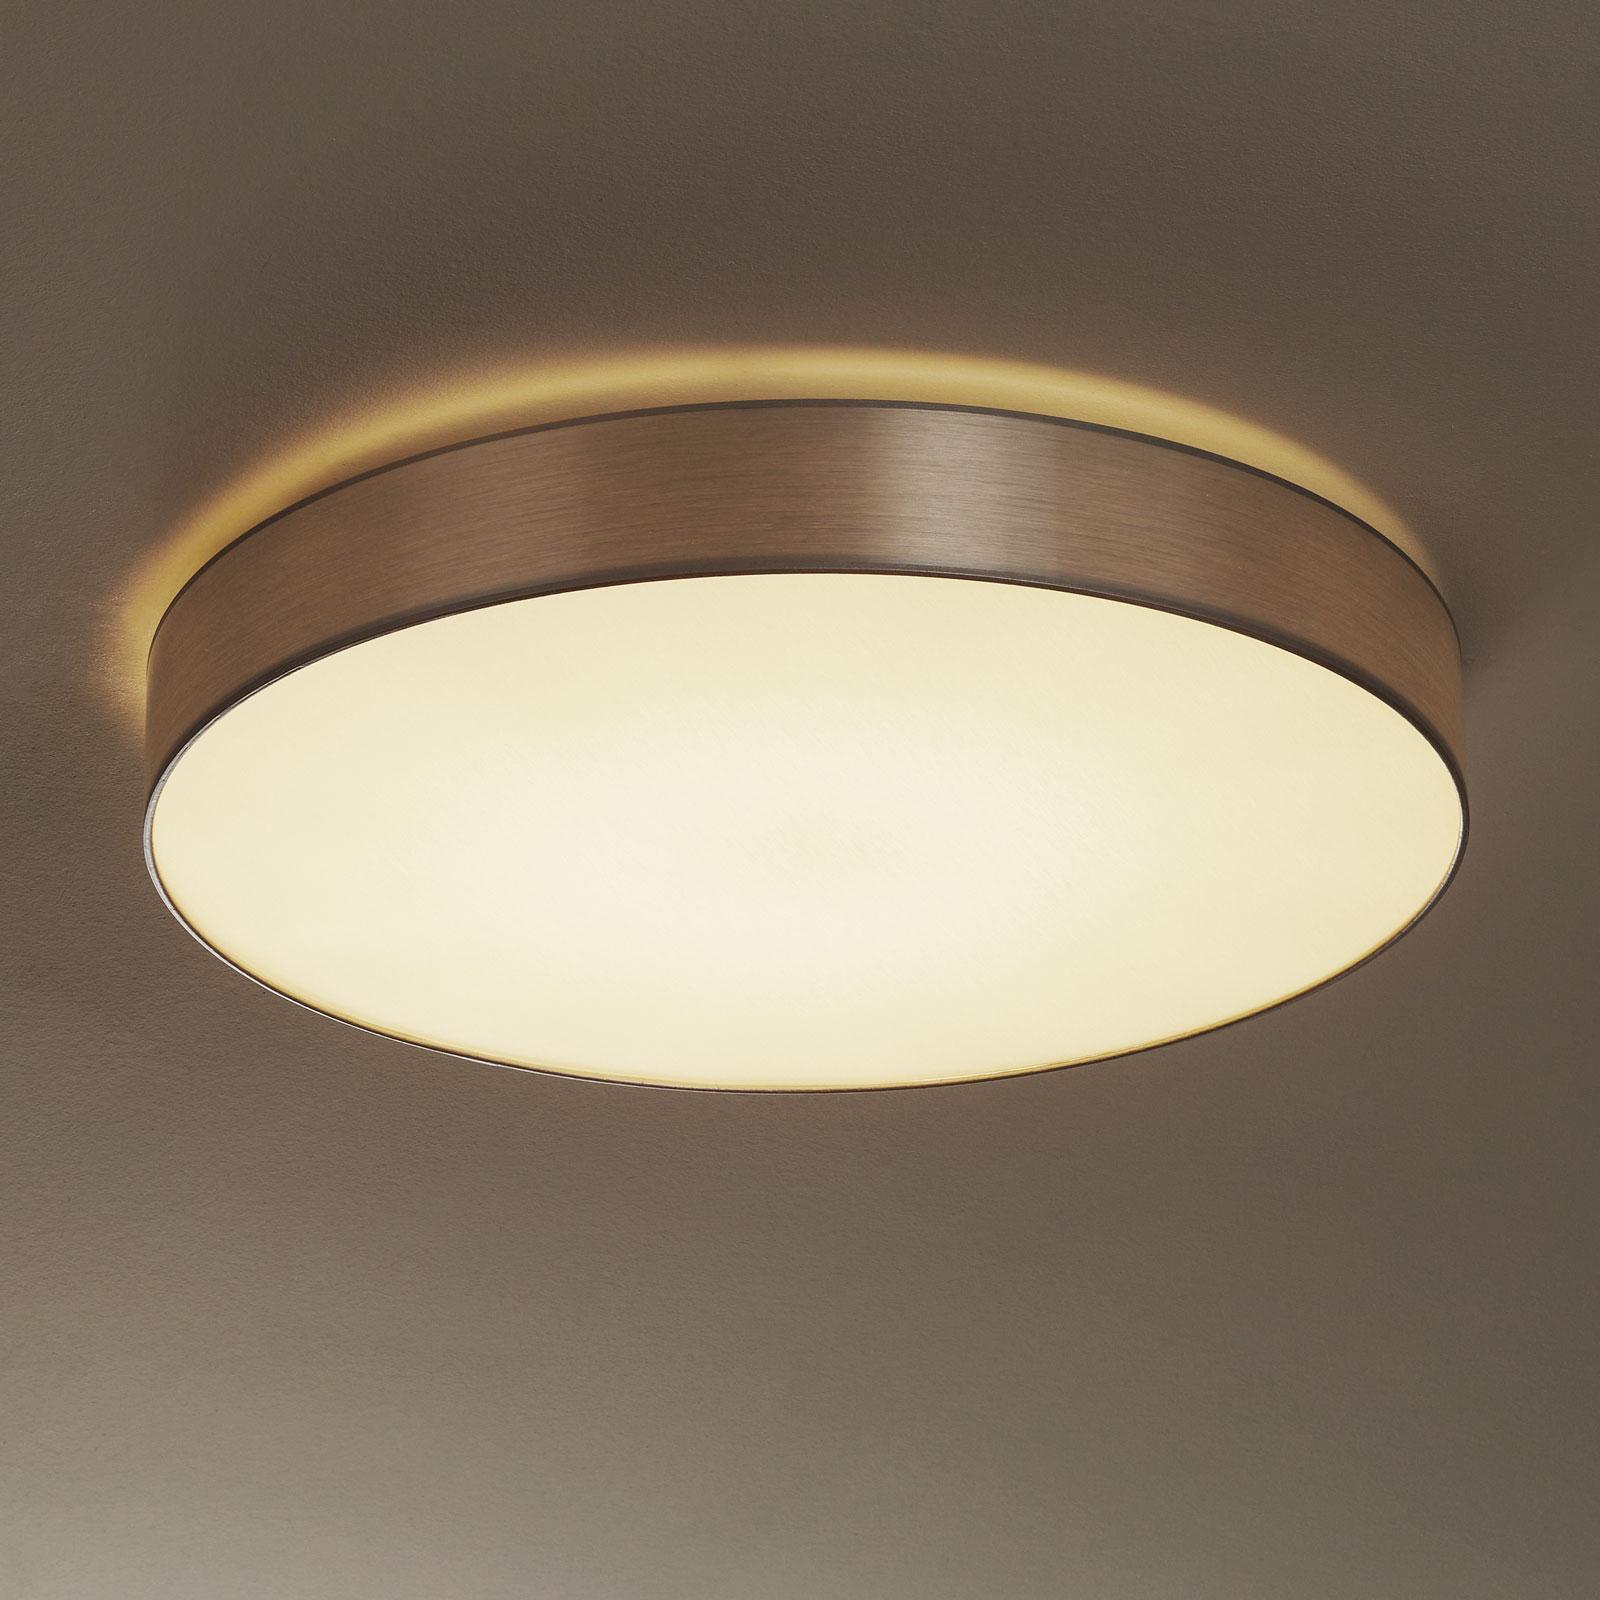 Aurelia - ściemniana lampa sufitowa LED